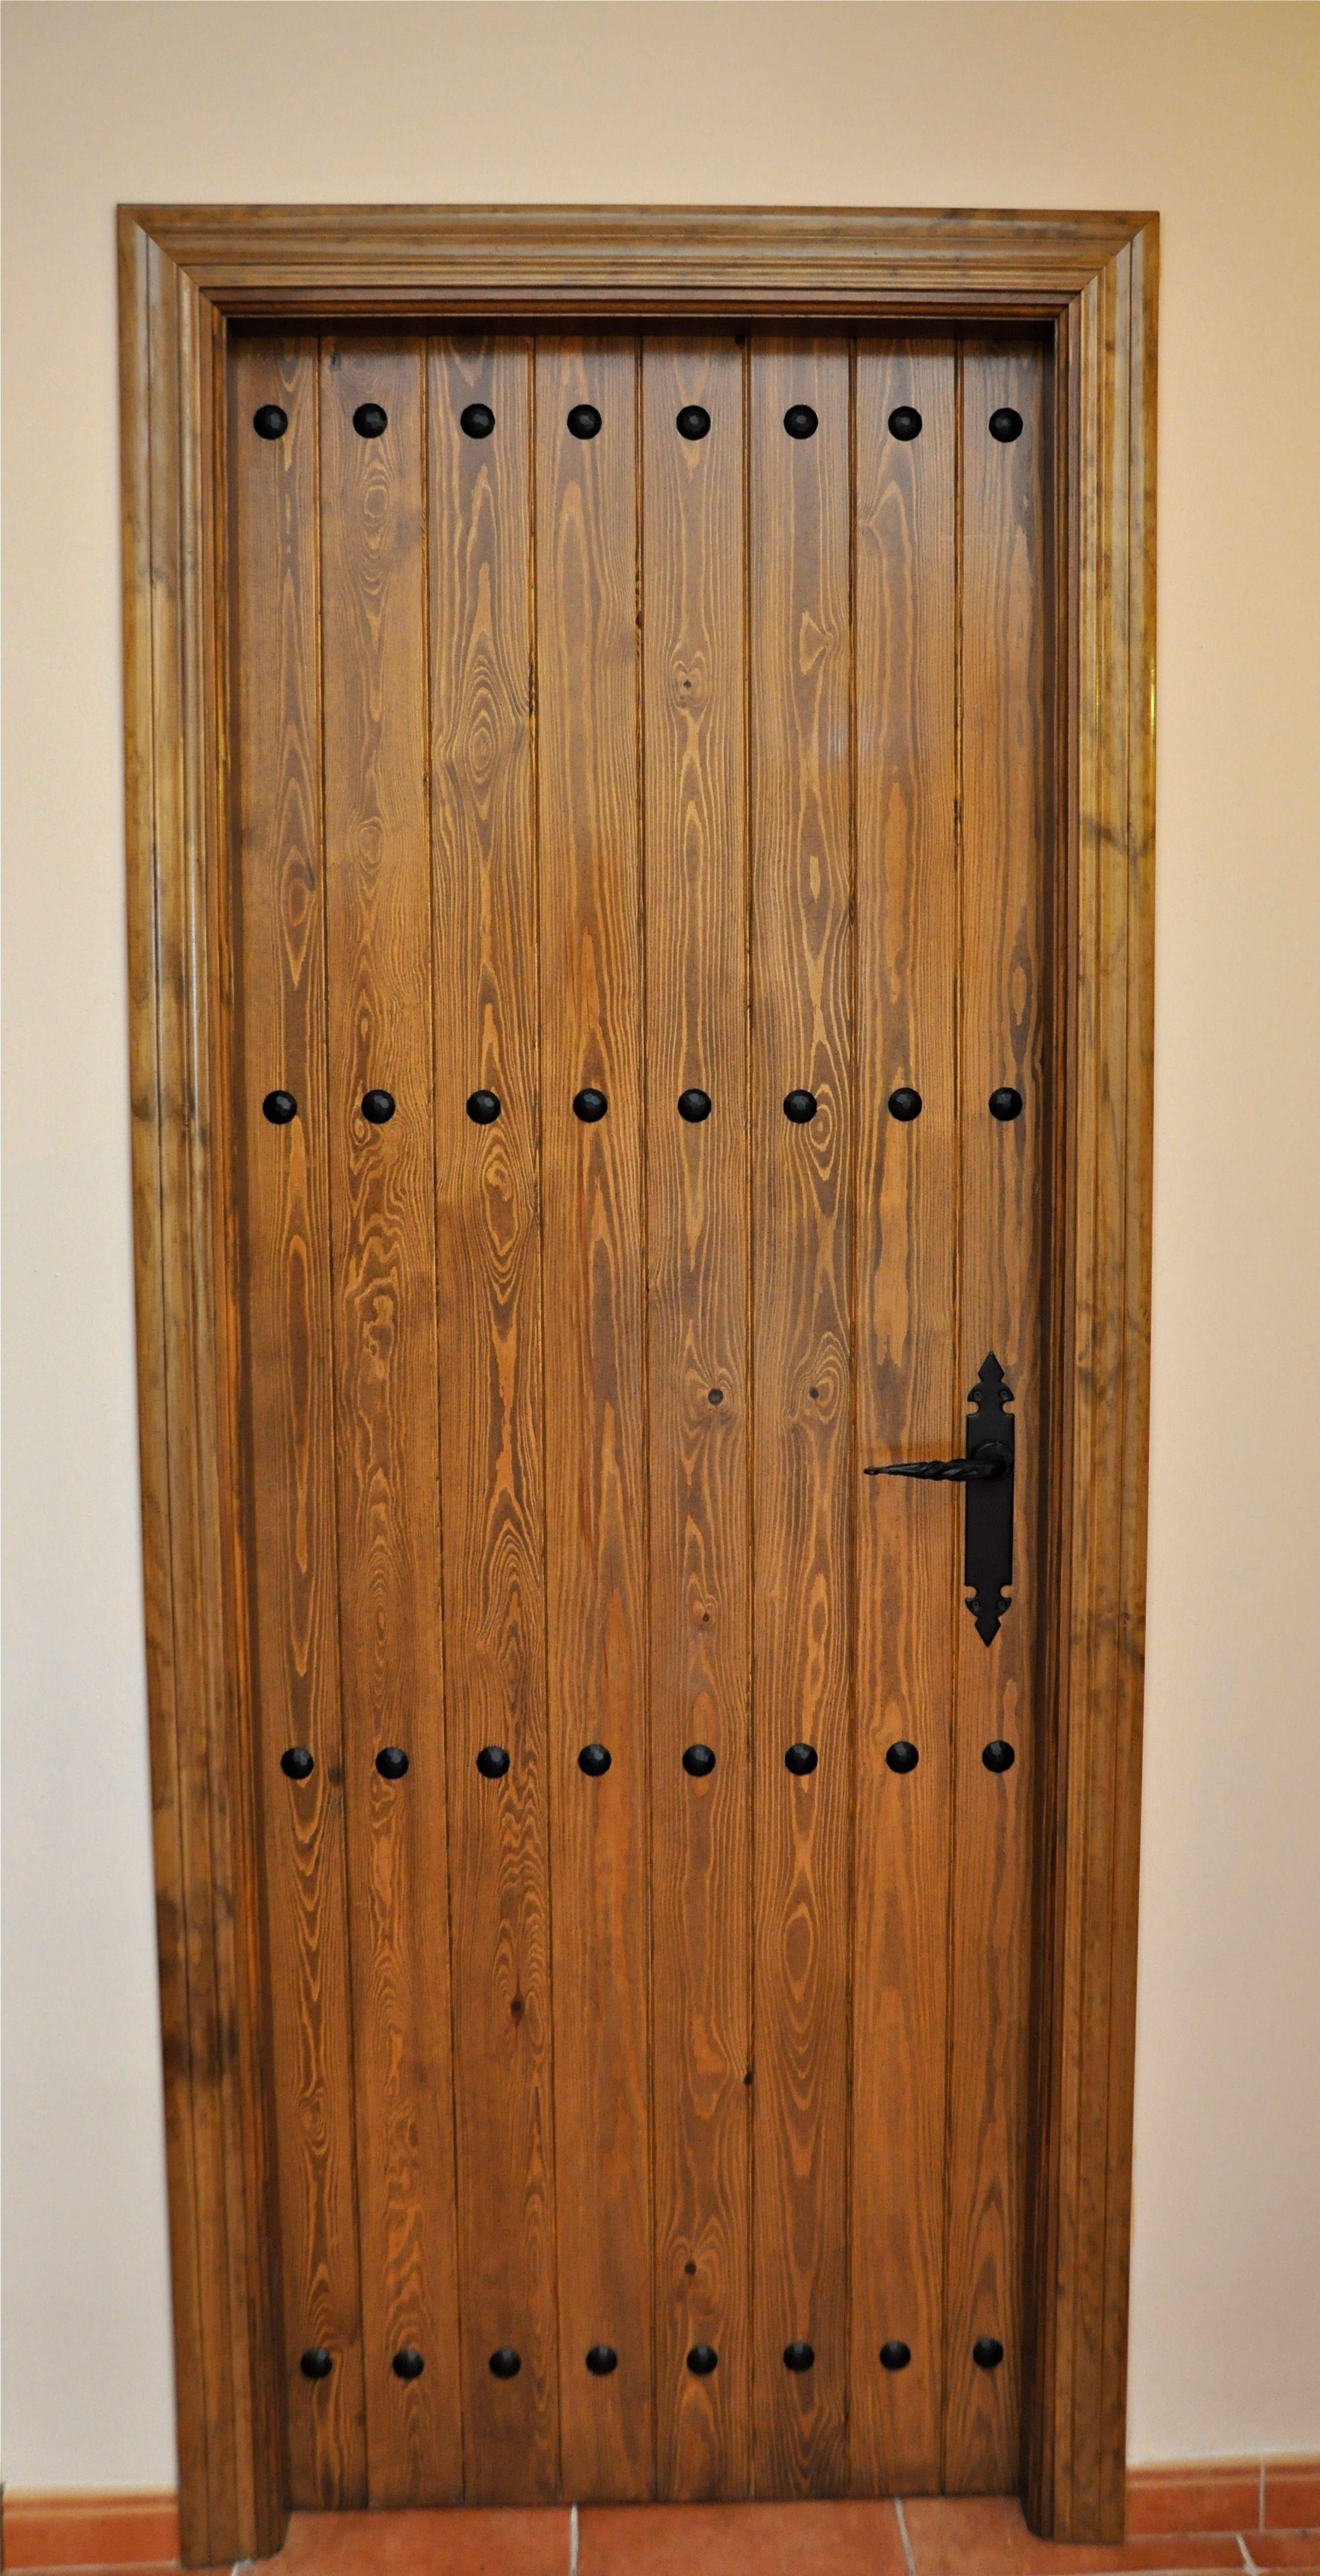 Pin de blanca aragon en puertas pinterest gitano for Puerta madera rustica